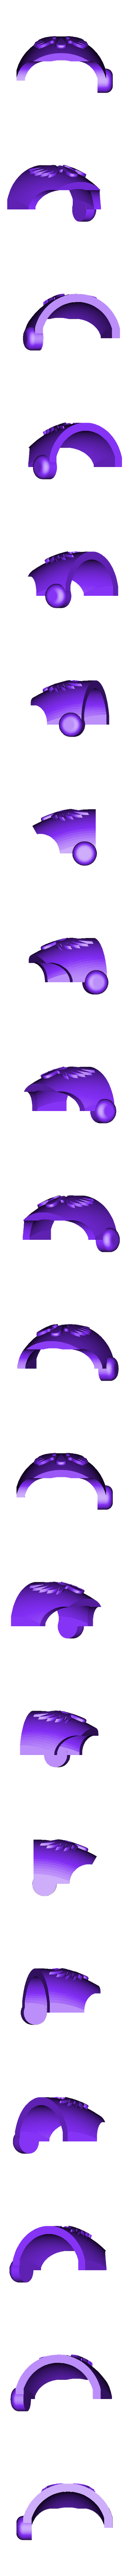 Terminator_-_Winged_Opals_2.stl Download free STL file Winged Opals - Marine Upgrade Pack • 3D printer model, GarinC3D